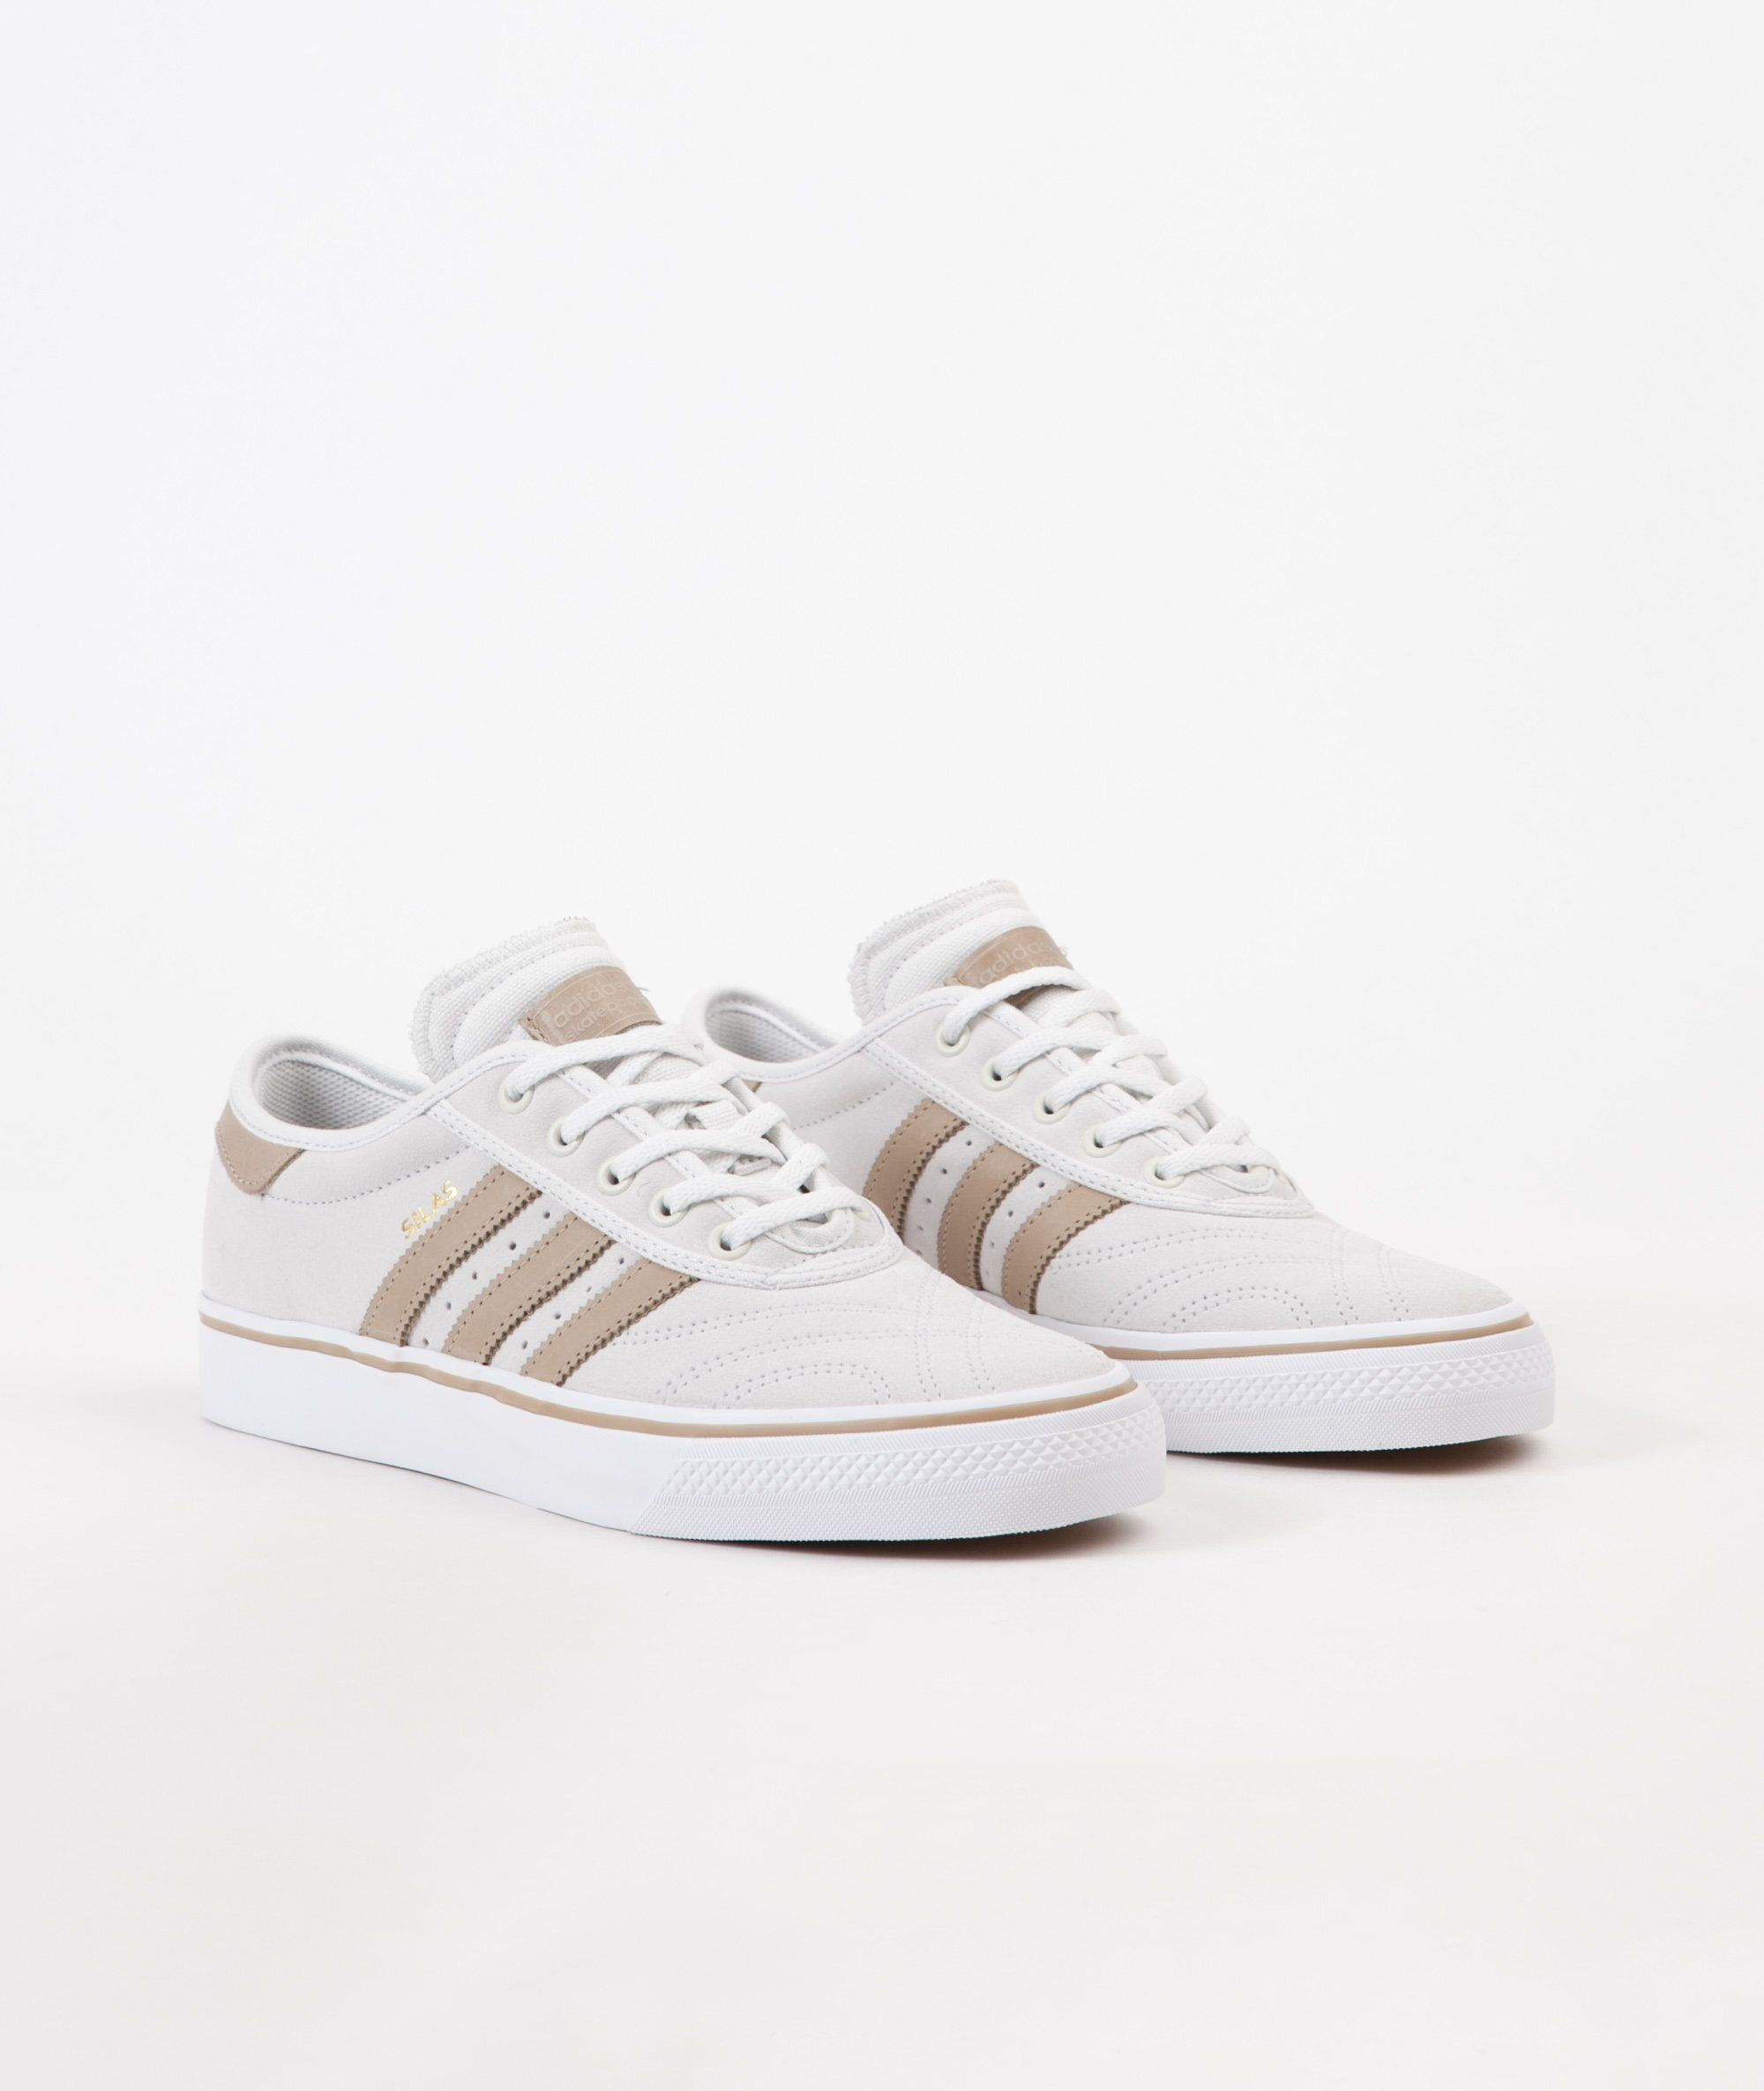 Ease Silas Adi Adidas Hemp Premiere White Ftw Shoes X Crystal N0w8vmn